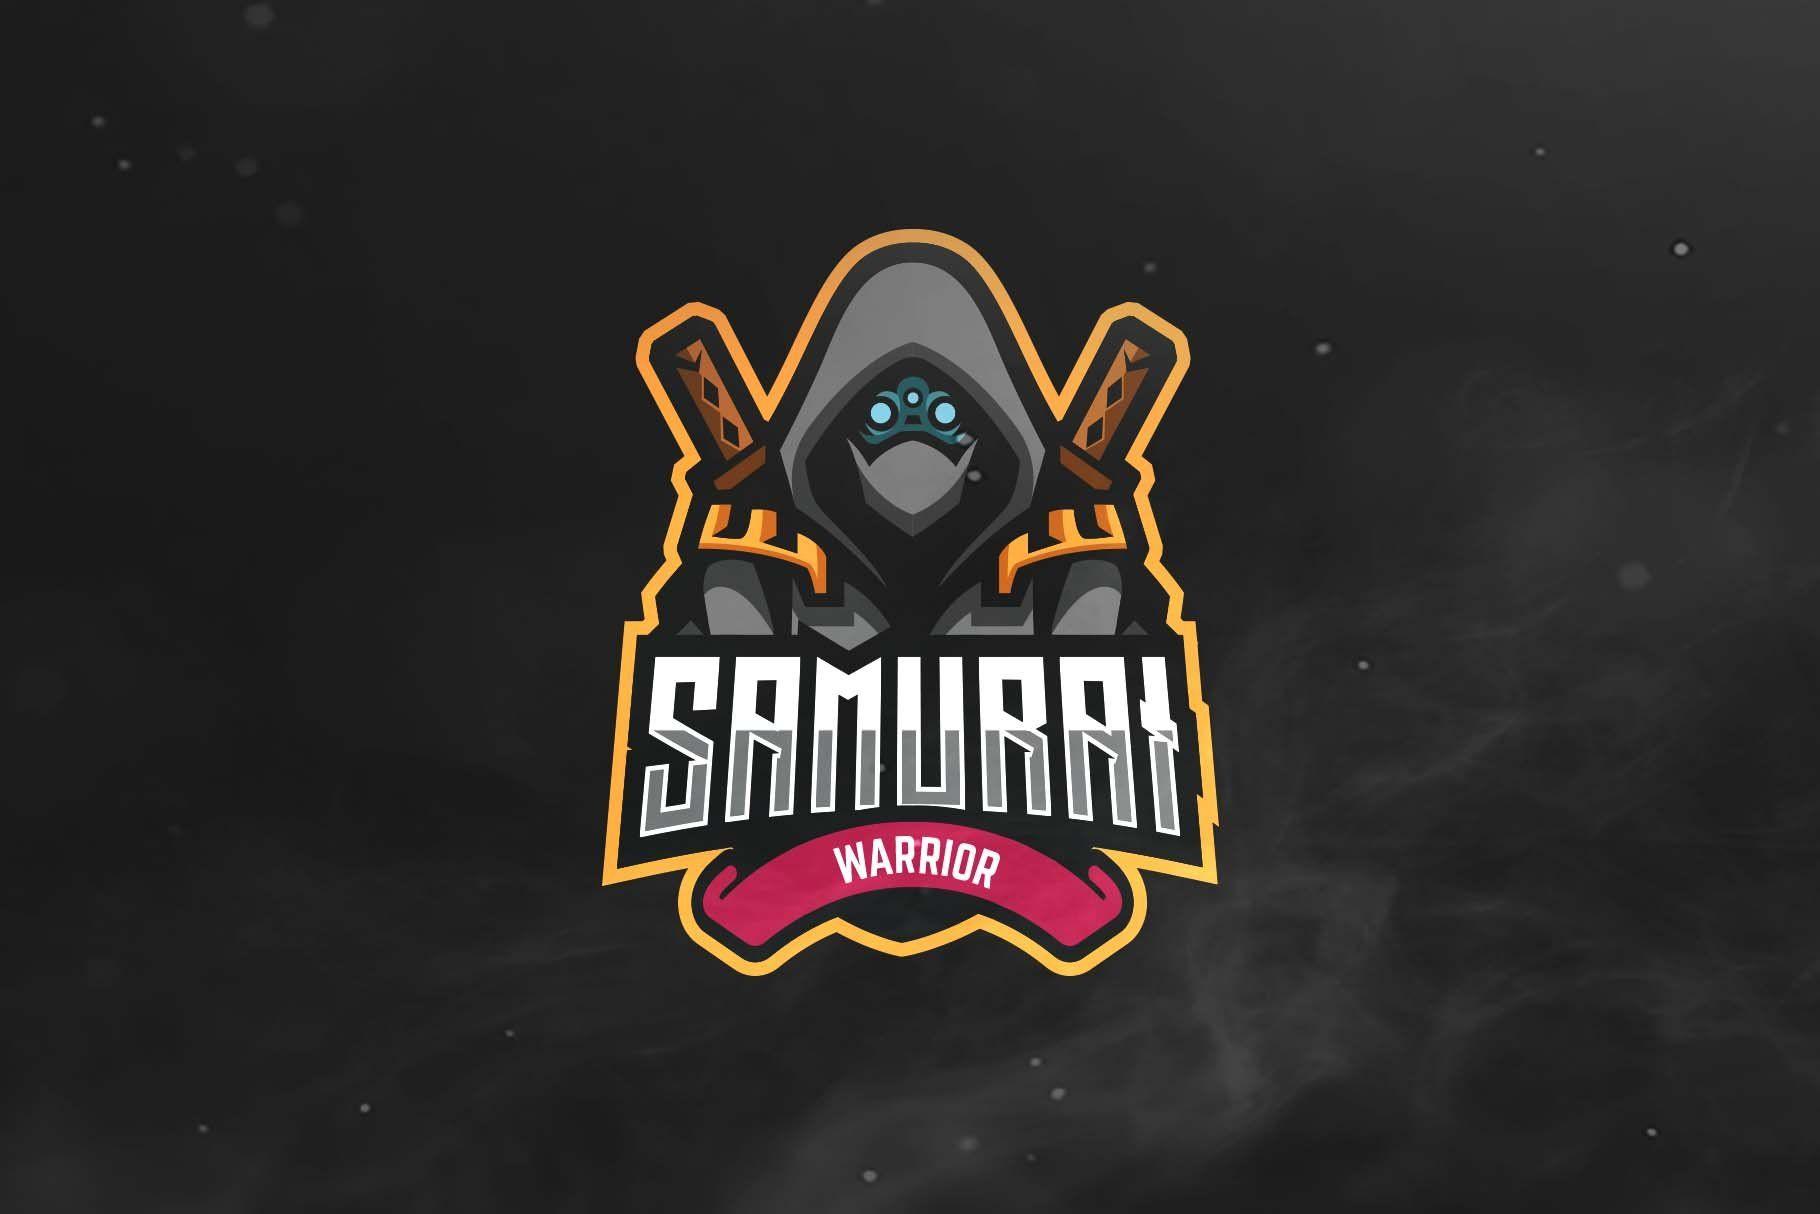 Samurai Sport and Esports Logo by ovozgraphics on